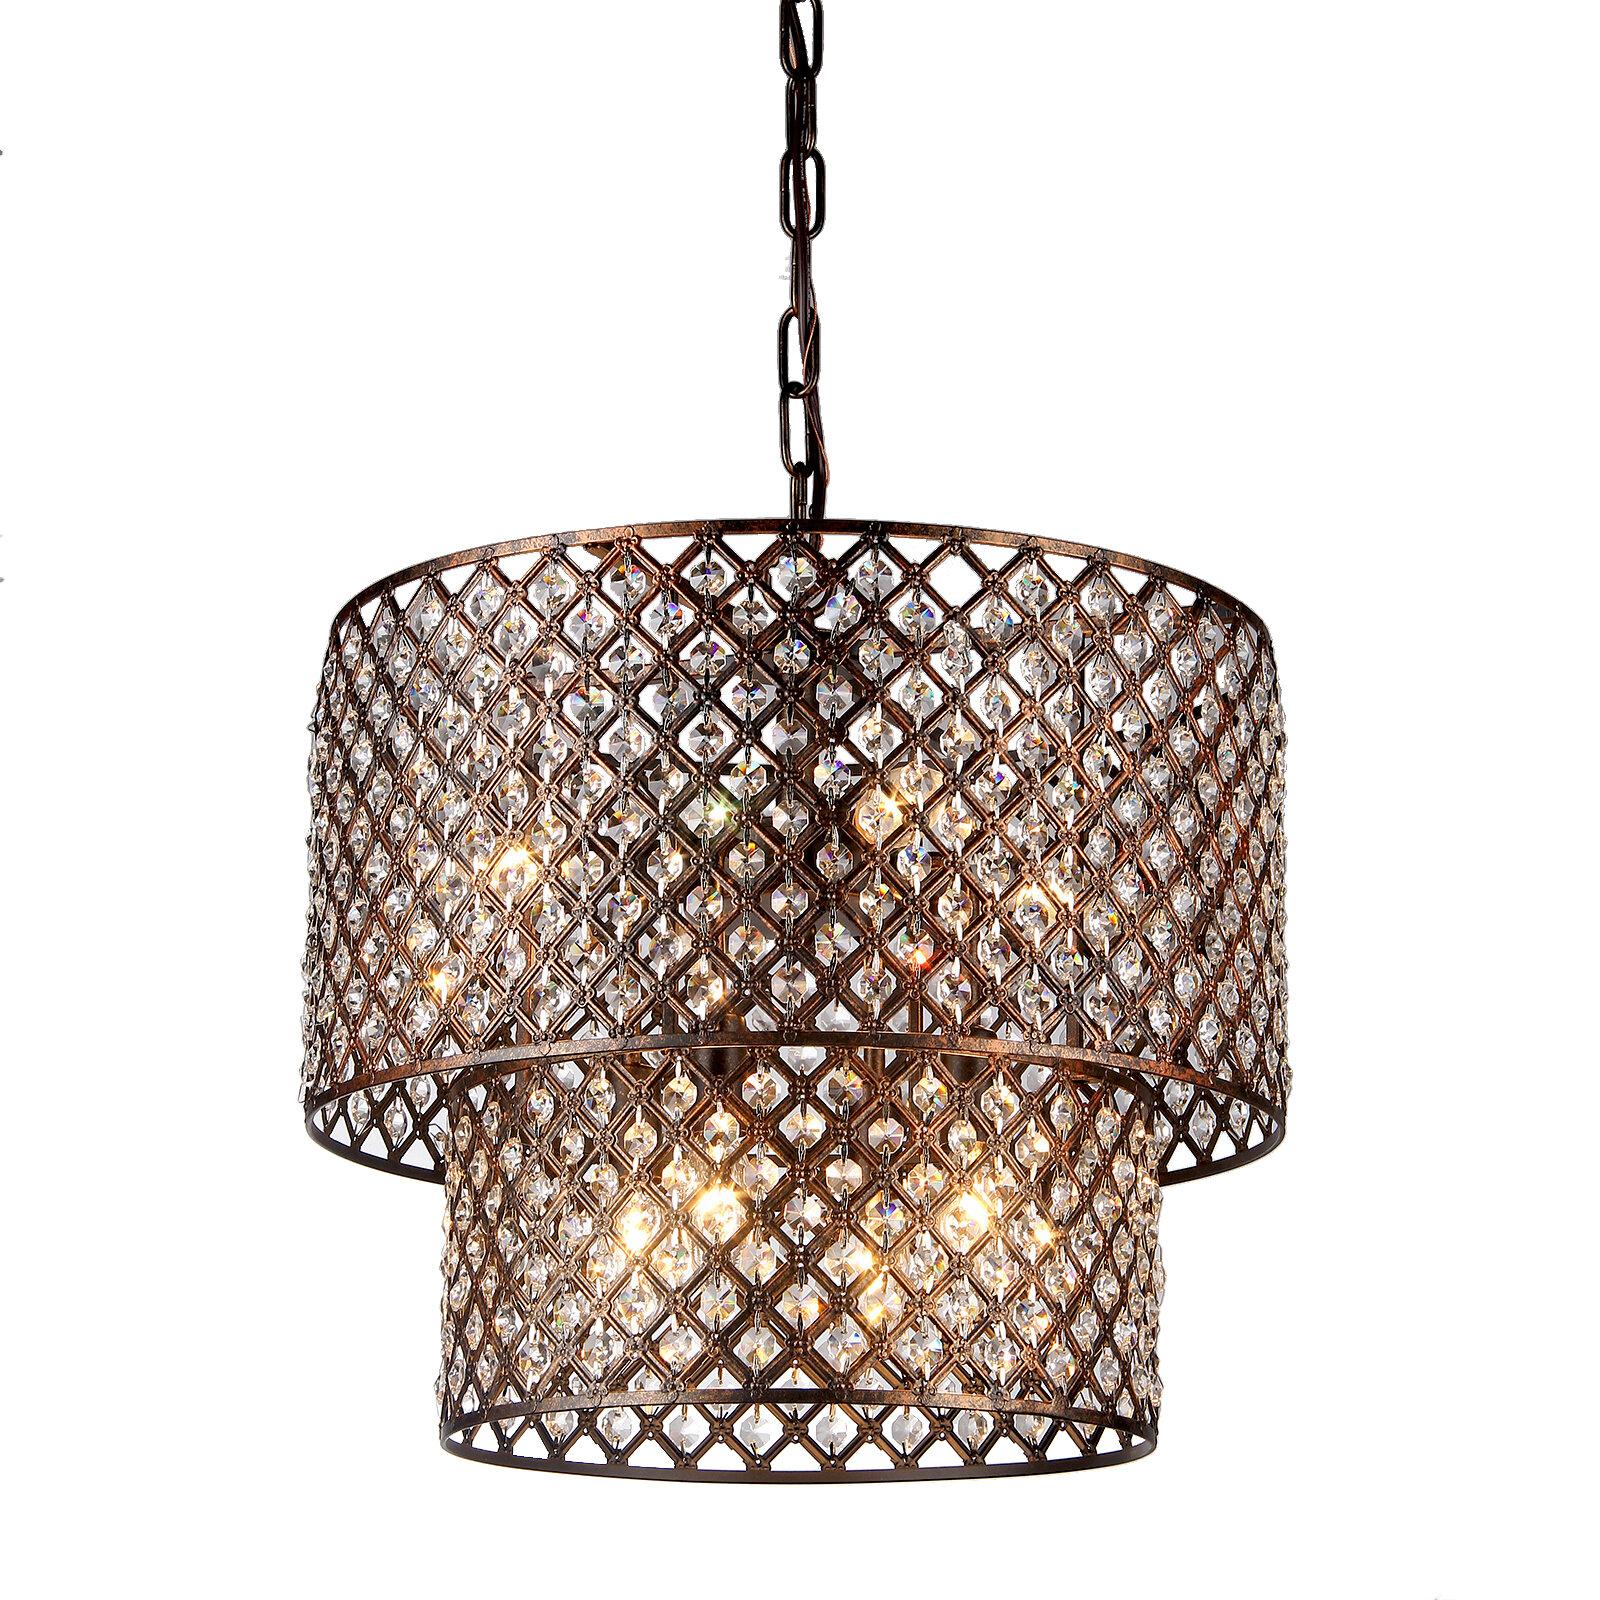 House of Hampton Clemence Crystal 8 Light Drum Chandelier